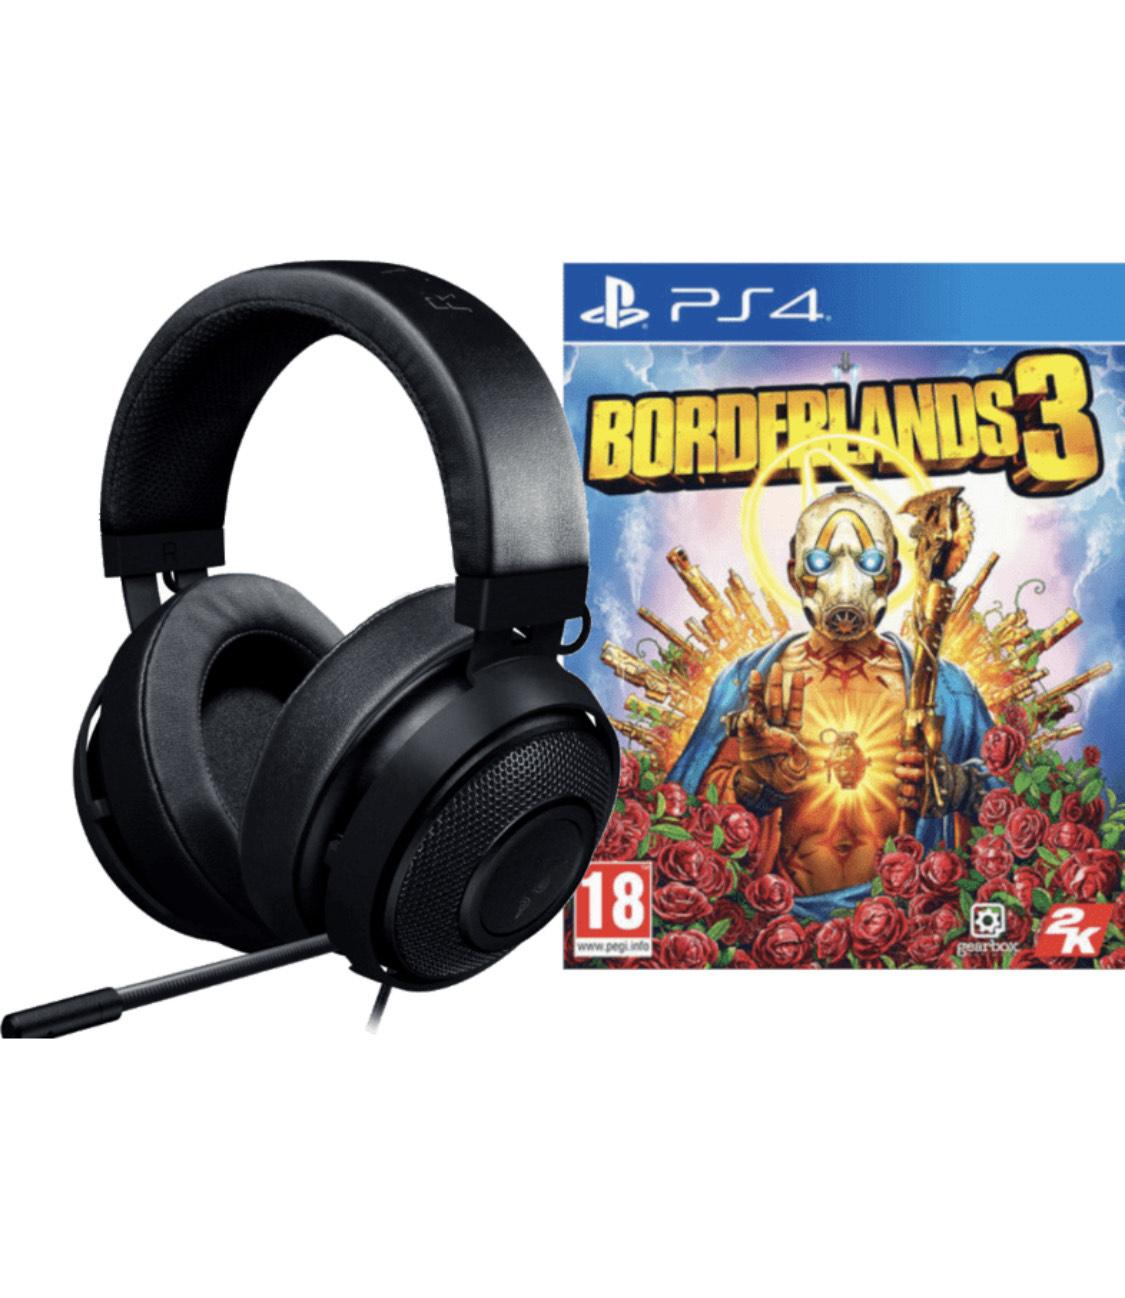 Razer Kraken Pro v2 für PS4 + Borderlands 3 PS4